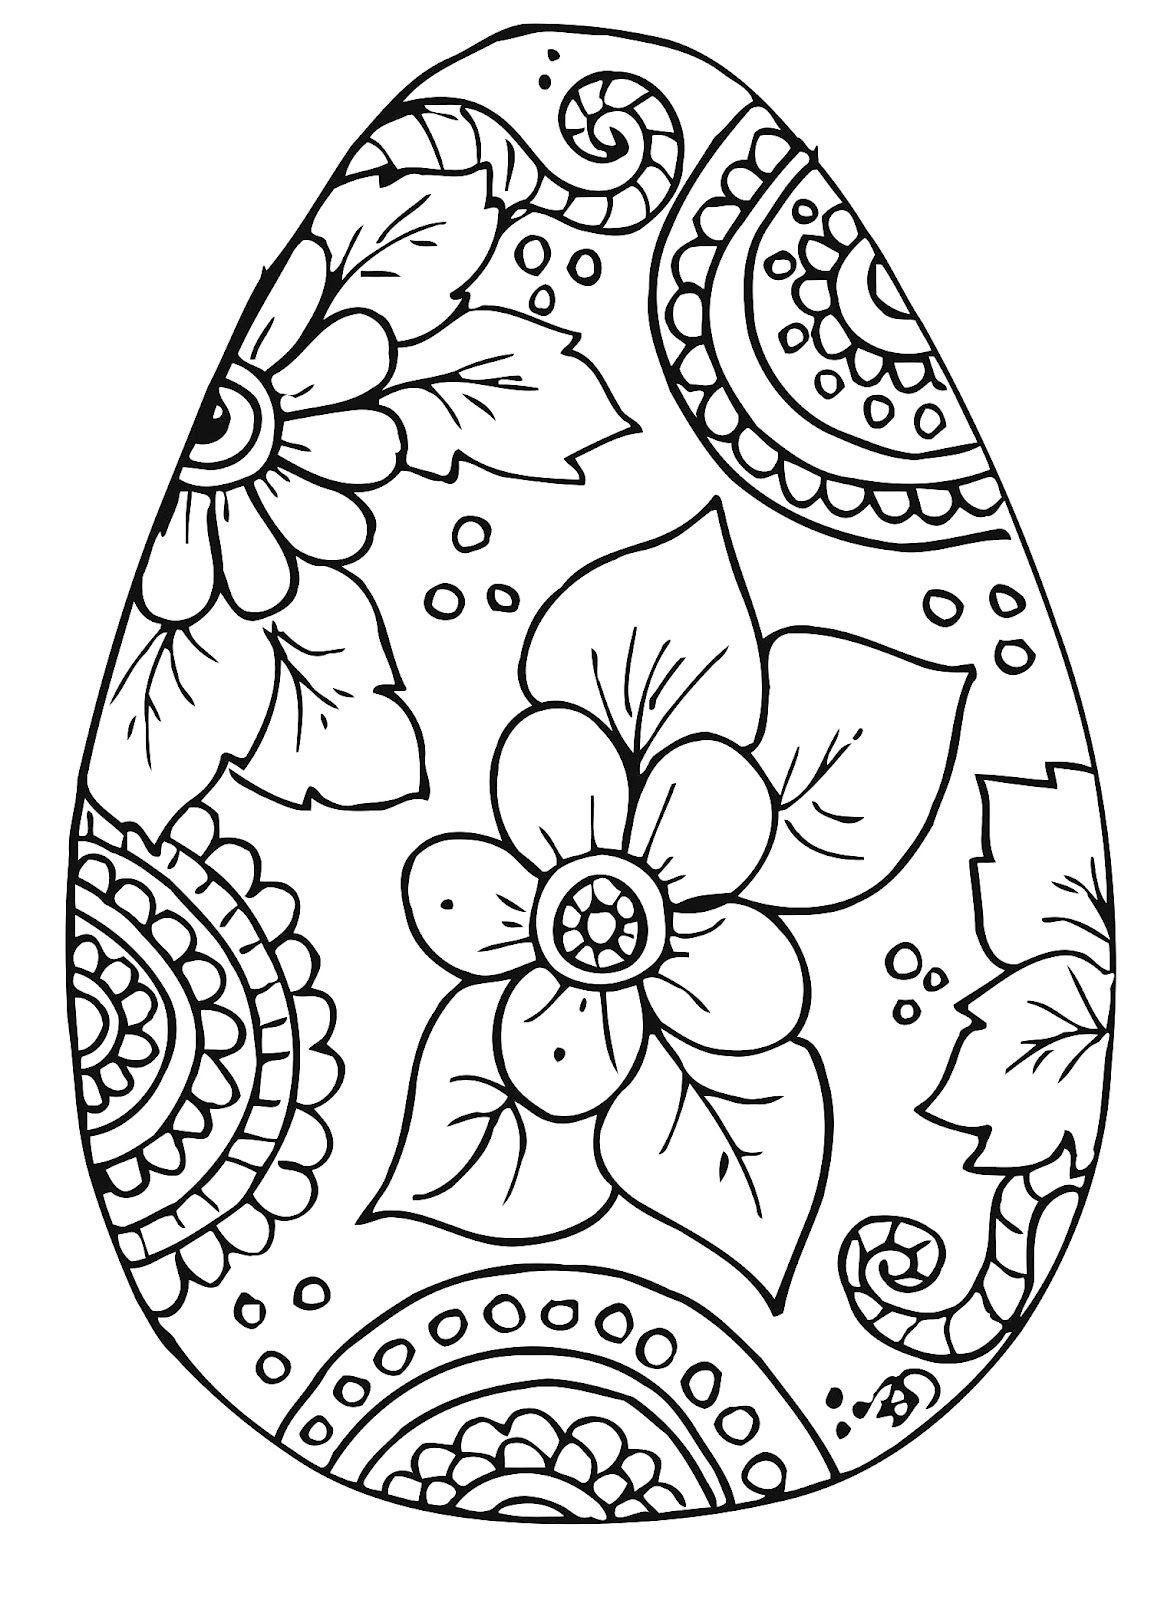 Easter Egg Coloring Page Detailed Easter Egg Coloring Page Free Printable Coloring Pages Entitlementtrap Com Easter Egg Coloring Pages Easter Coloring Pages Printable Coloring Easter Eggs